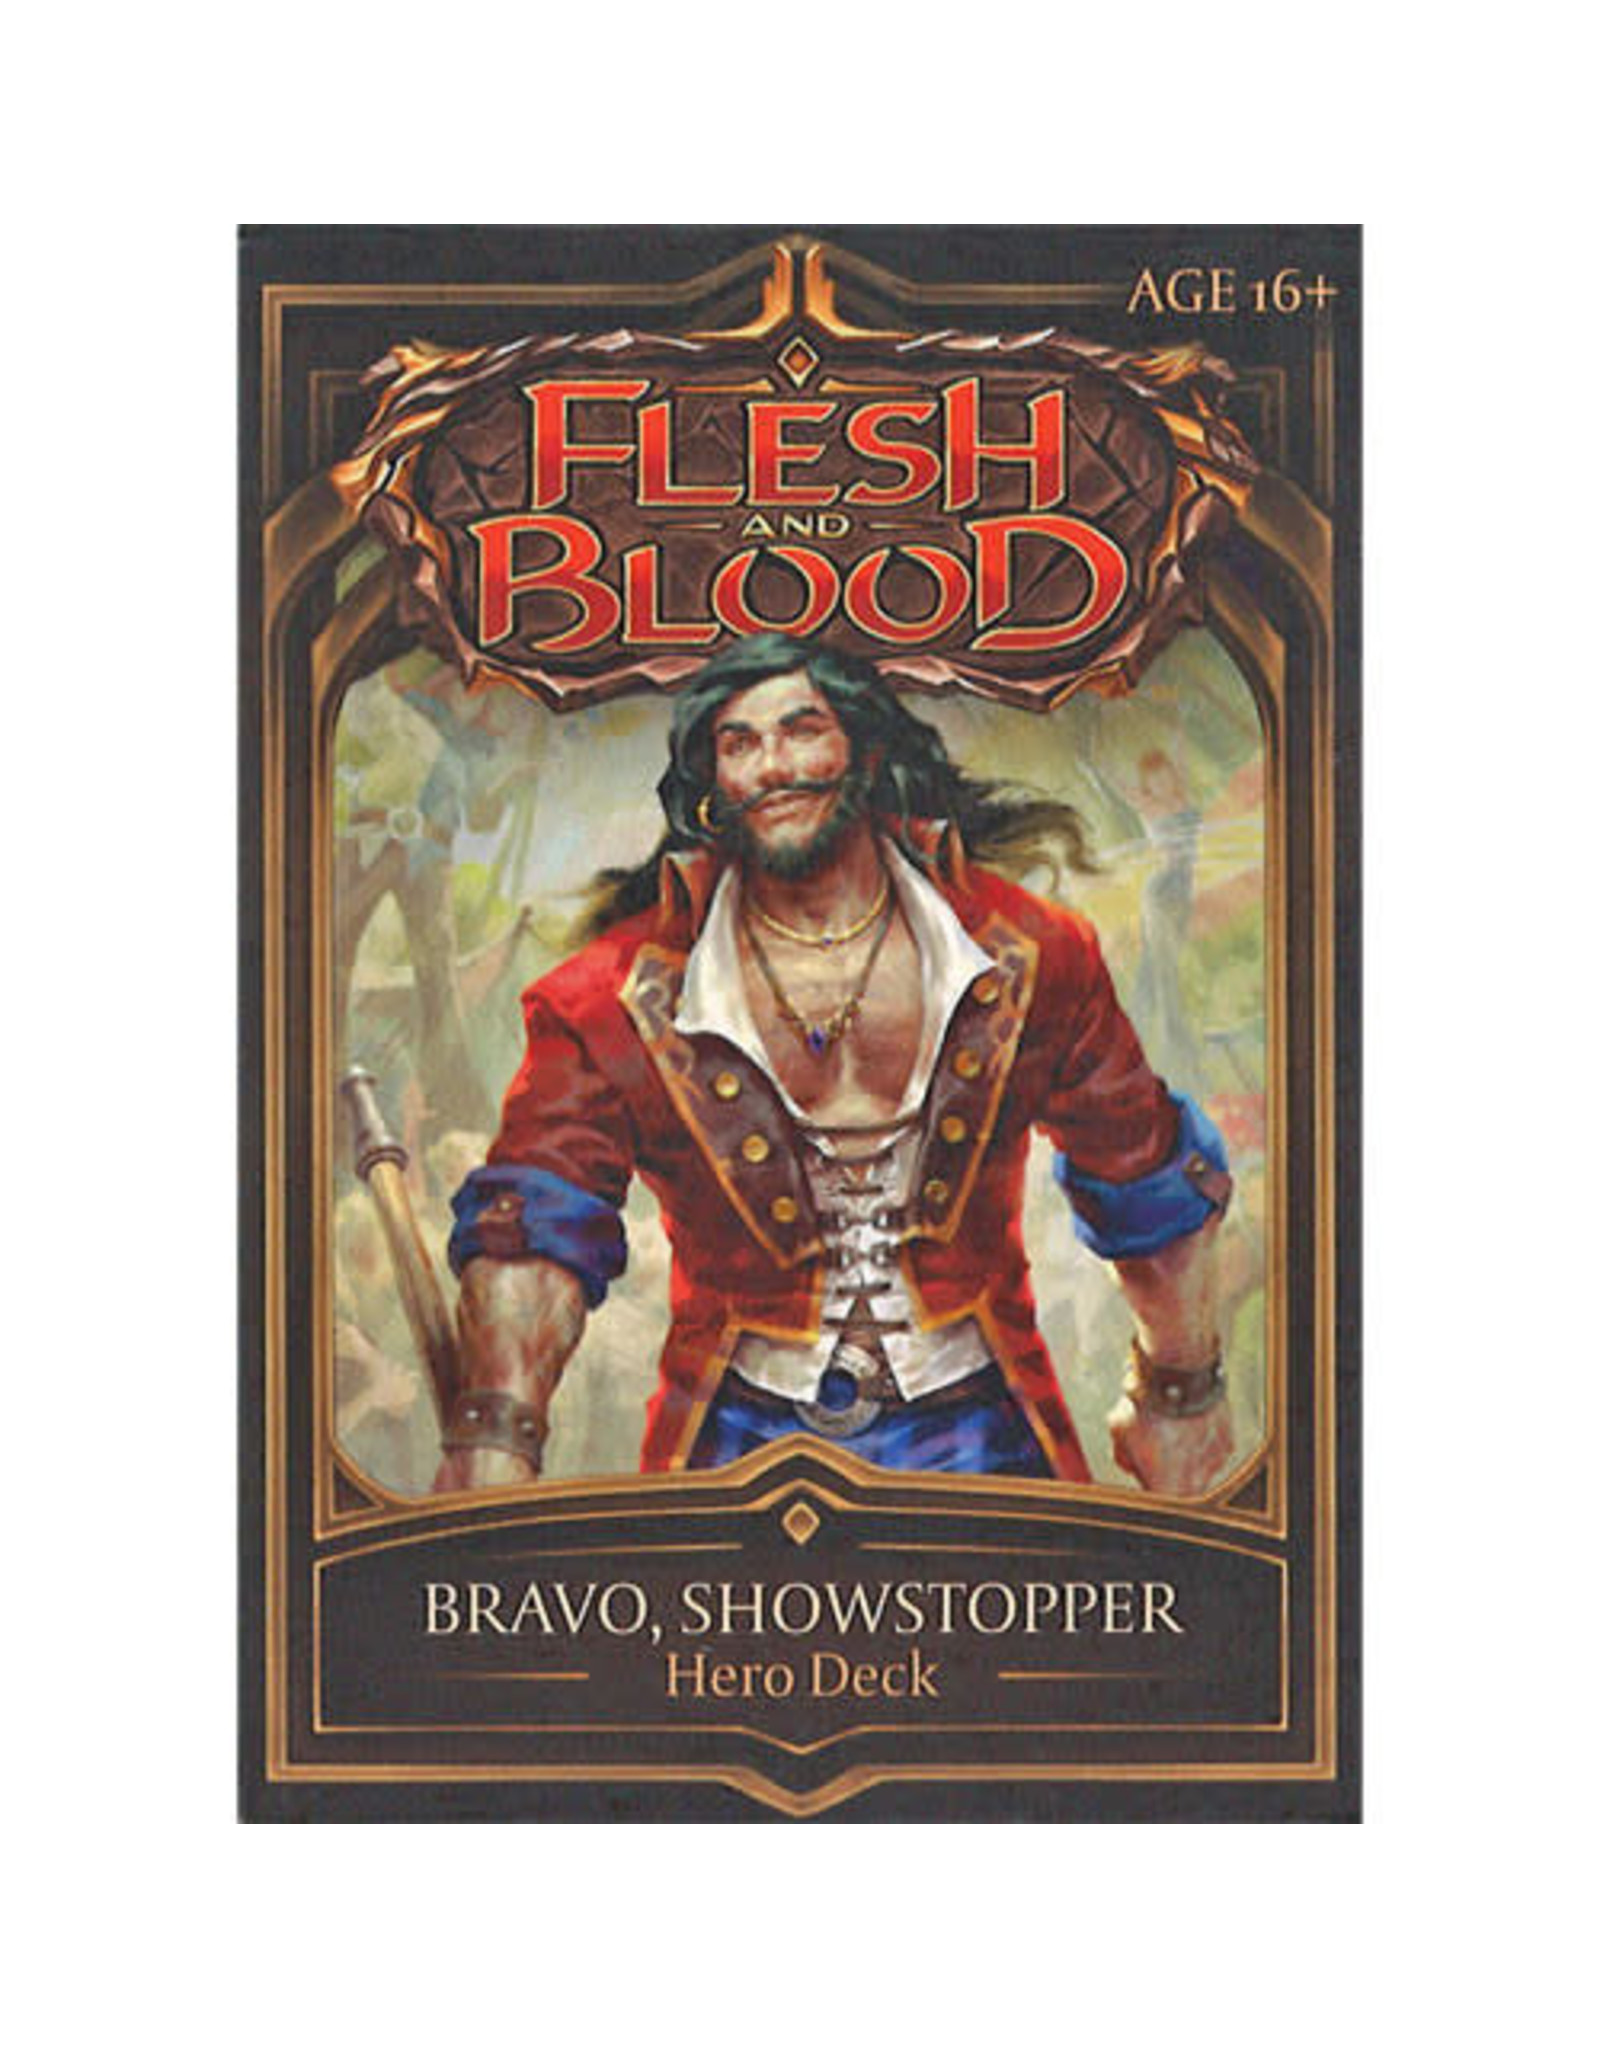 Flesh and Blood: Bravo, Showstopper Hero Deck